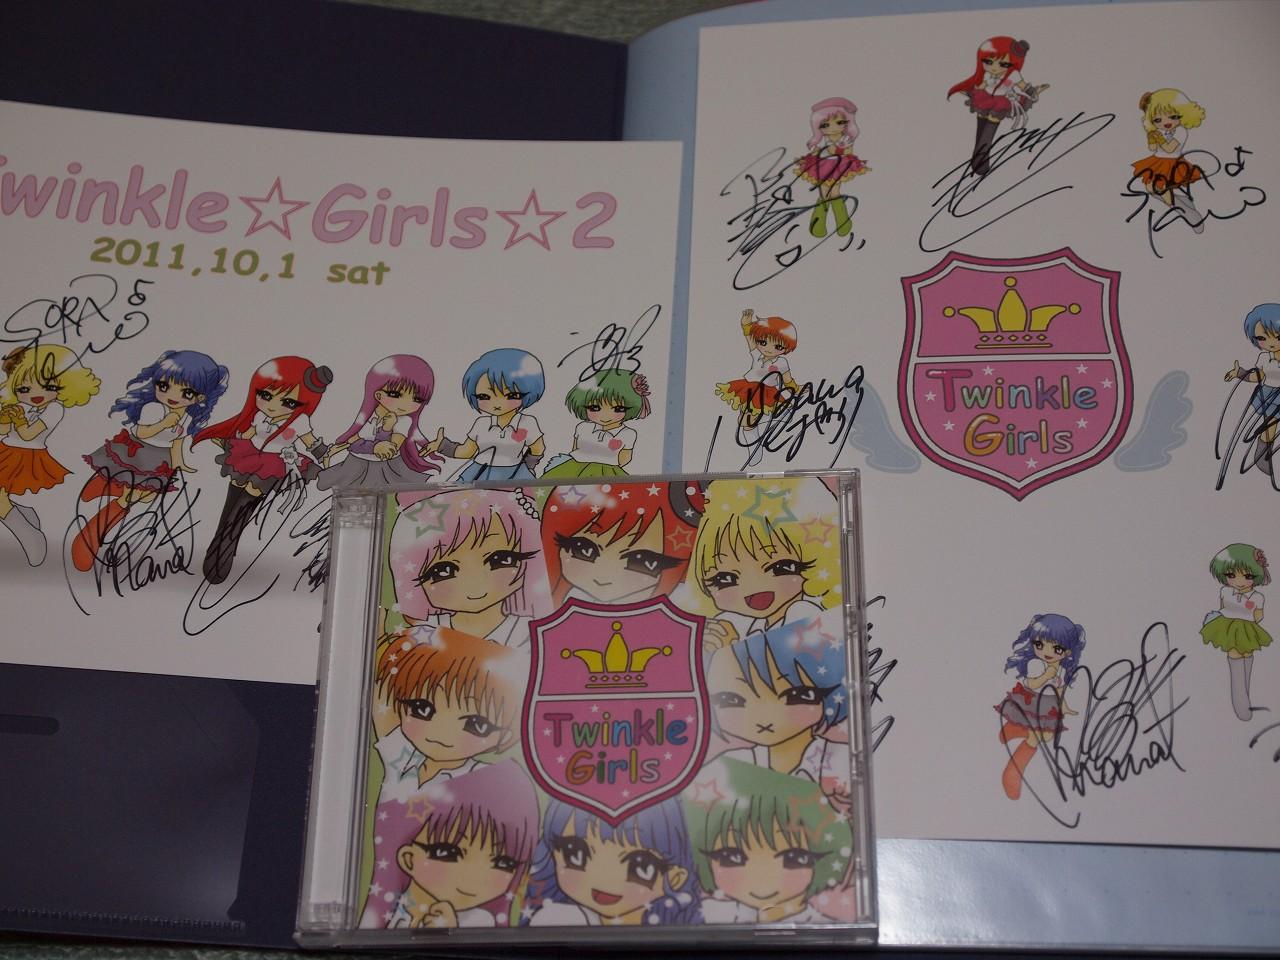 ☆Twinkle☆Girls☆2 サイン&アルバム